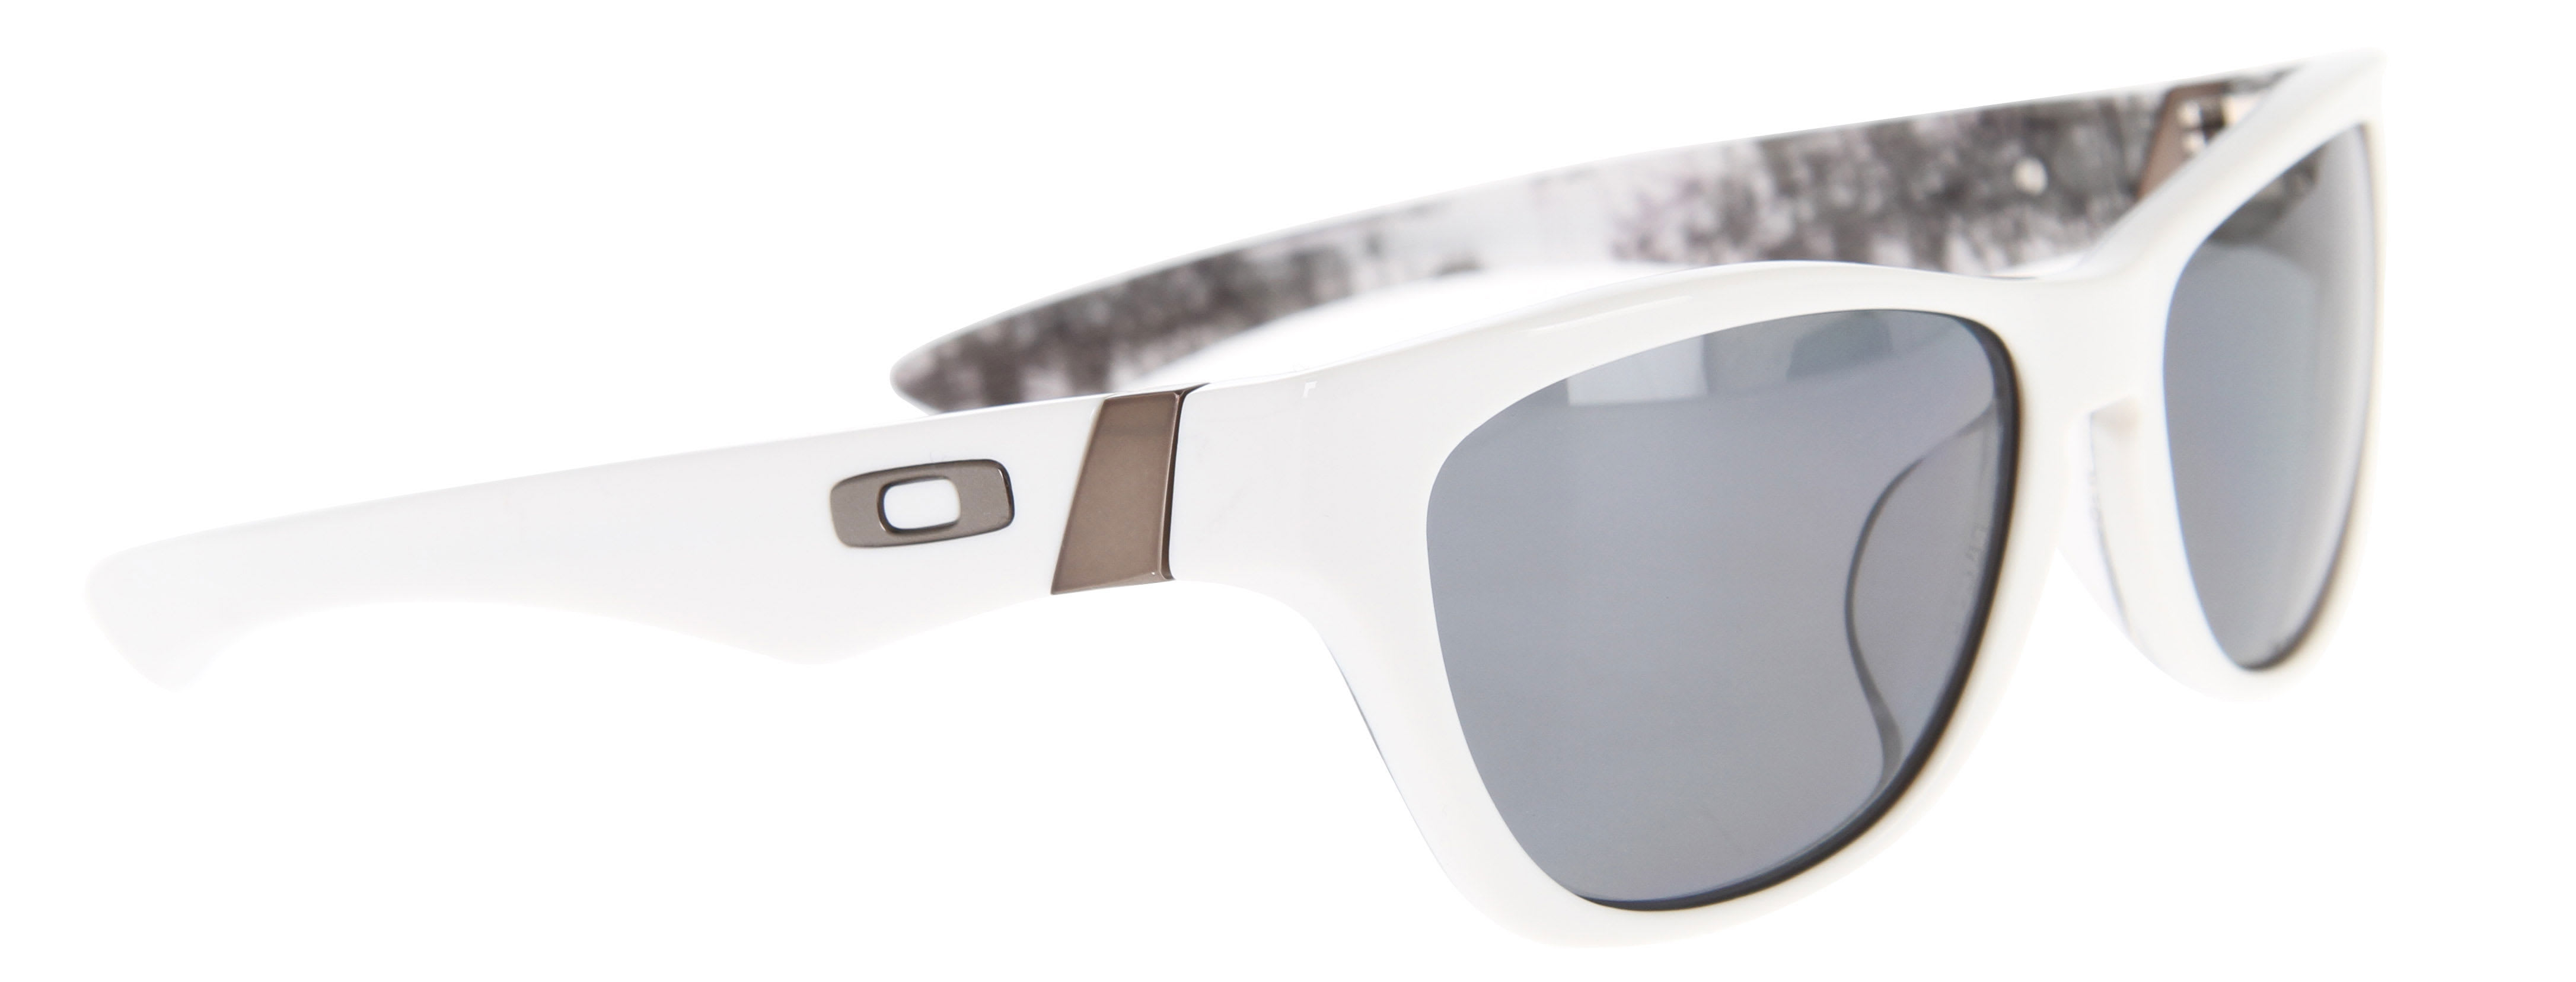 abc043fafb Oakley Jupiter LX Sunglasses - thumbnail 1